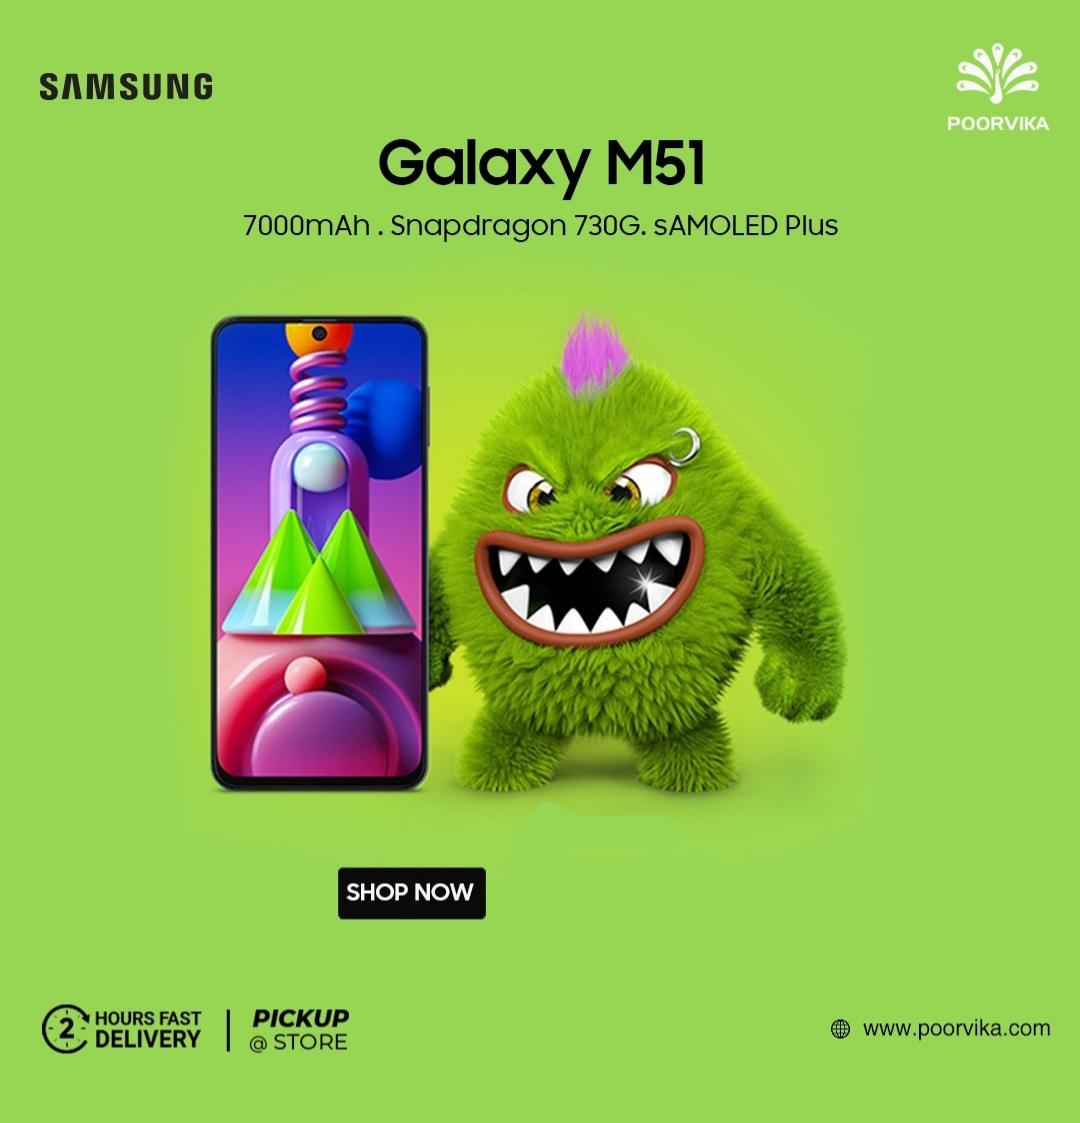 Samsung-Galaxy-M51-poorvika-mobiles